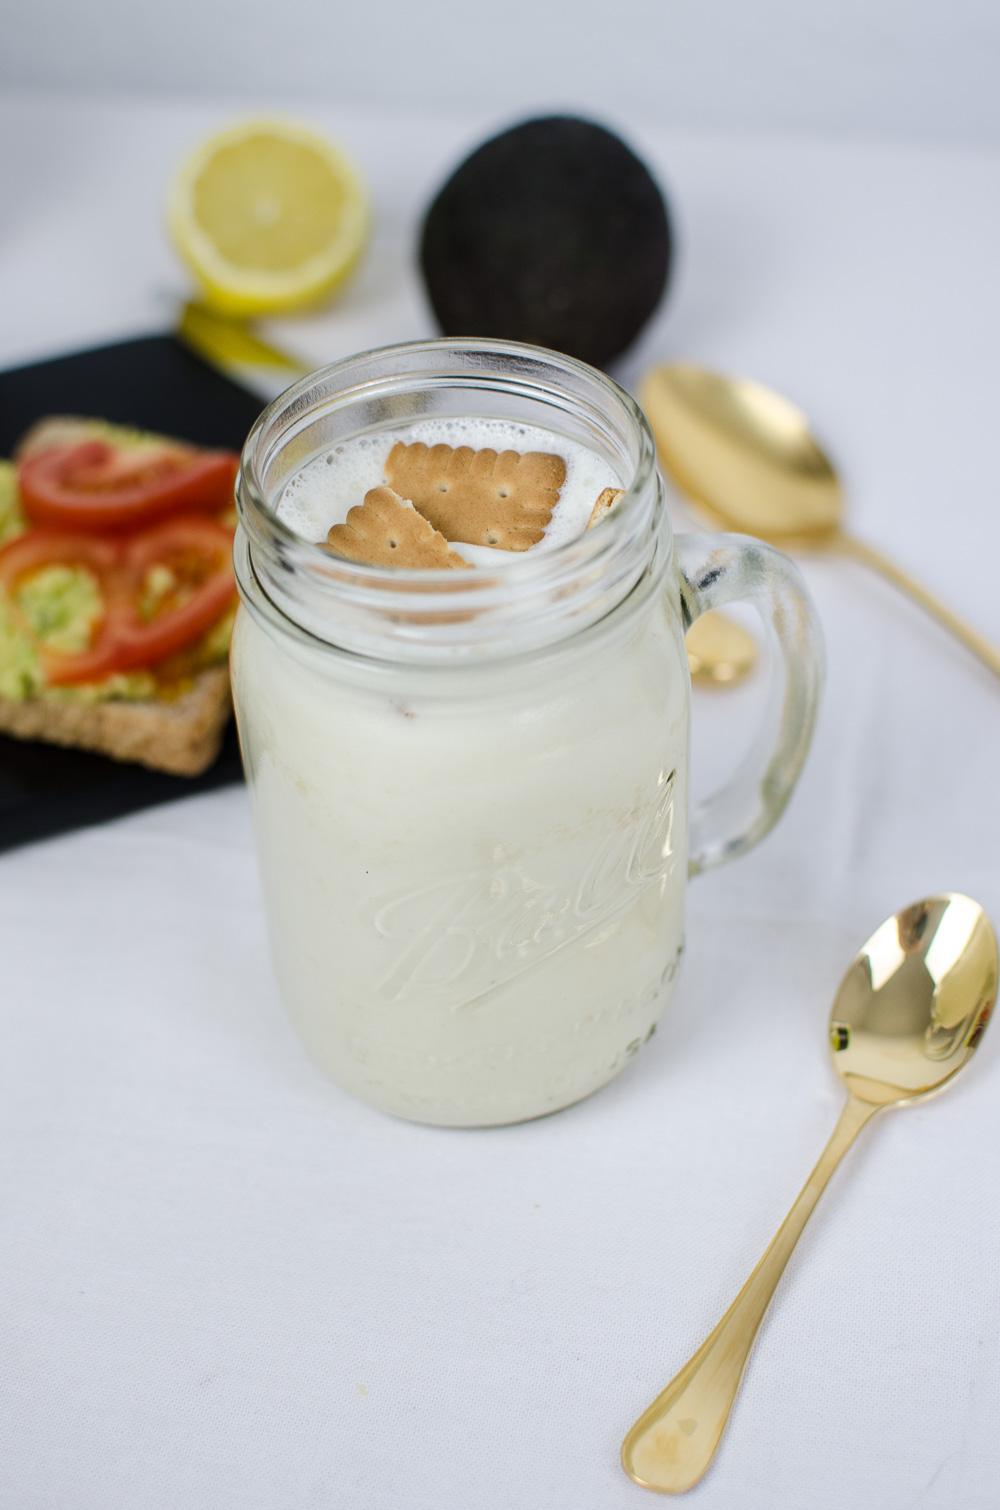 andysparkles-Gesundes Frühstück-Apfel Smoothie